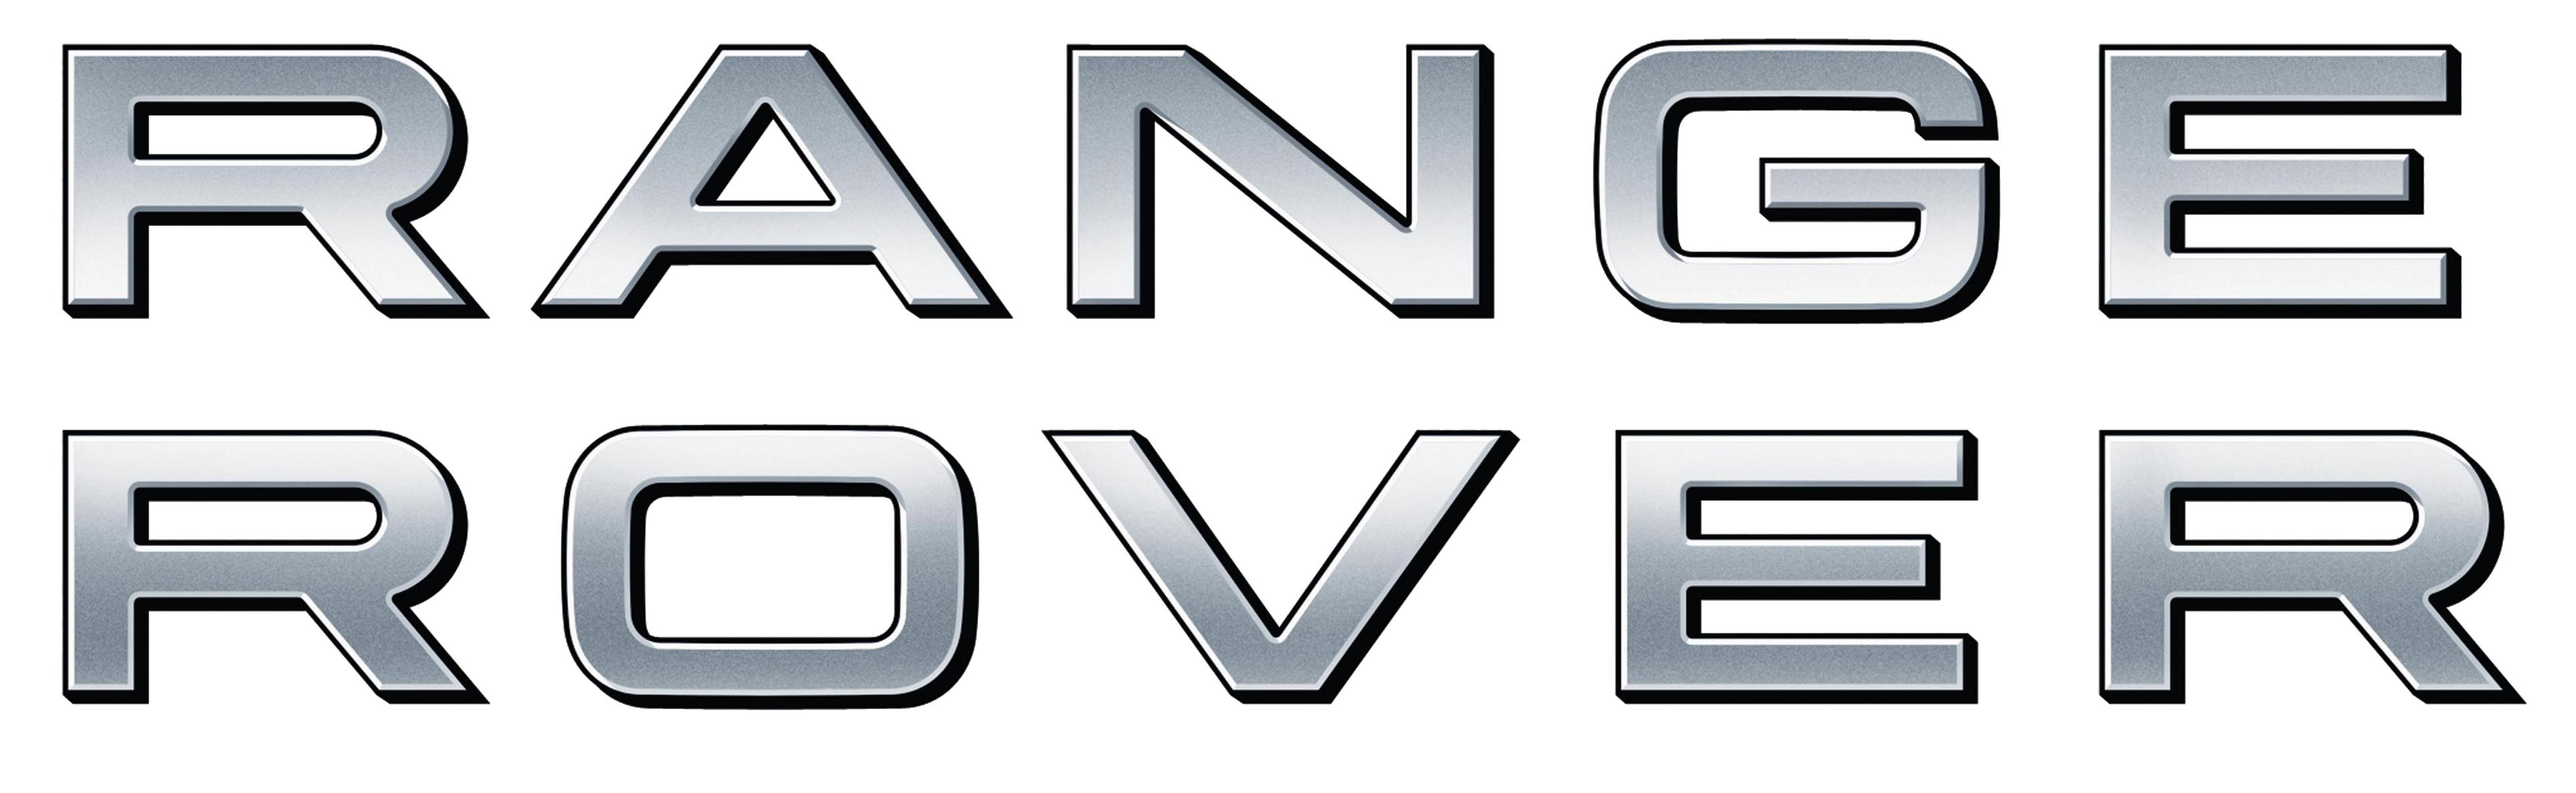 Range Rover logo PNG.